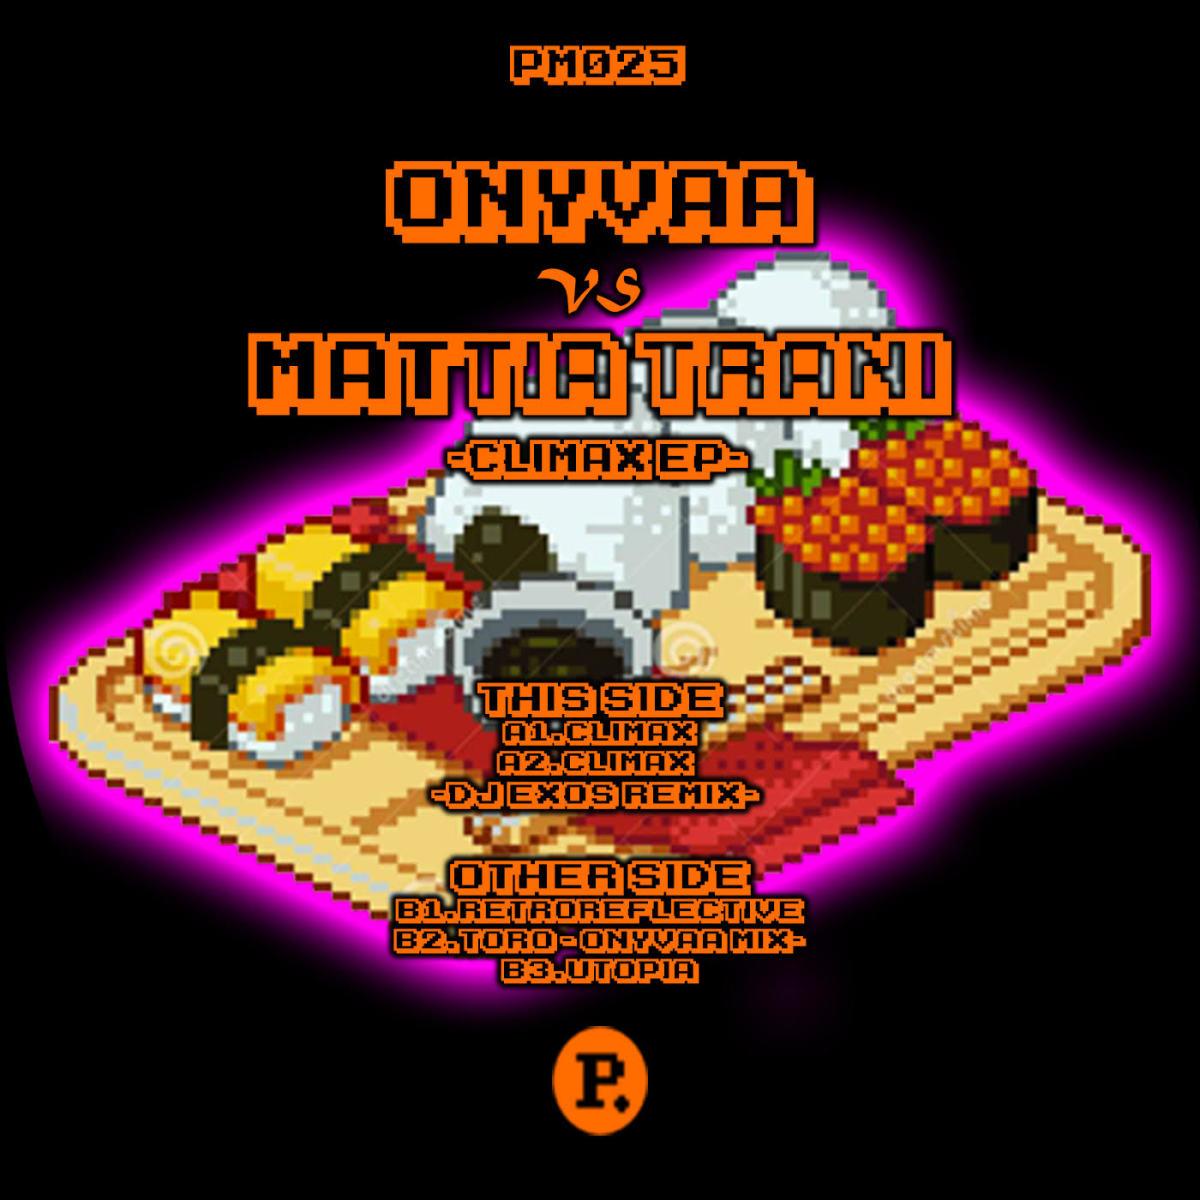 Onyvaa vs Mattia Trani - Climax EP [Pushmaster Discs]